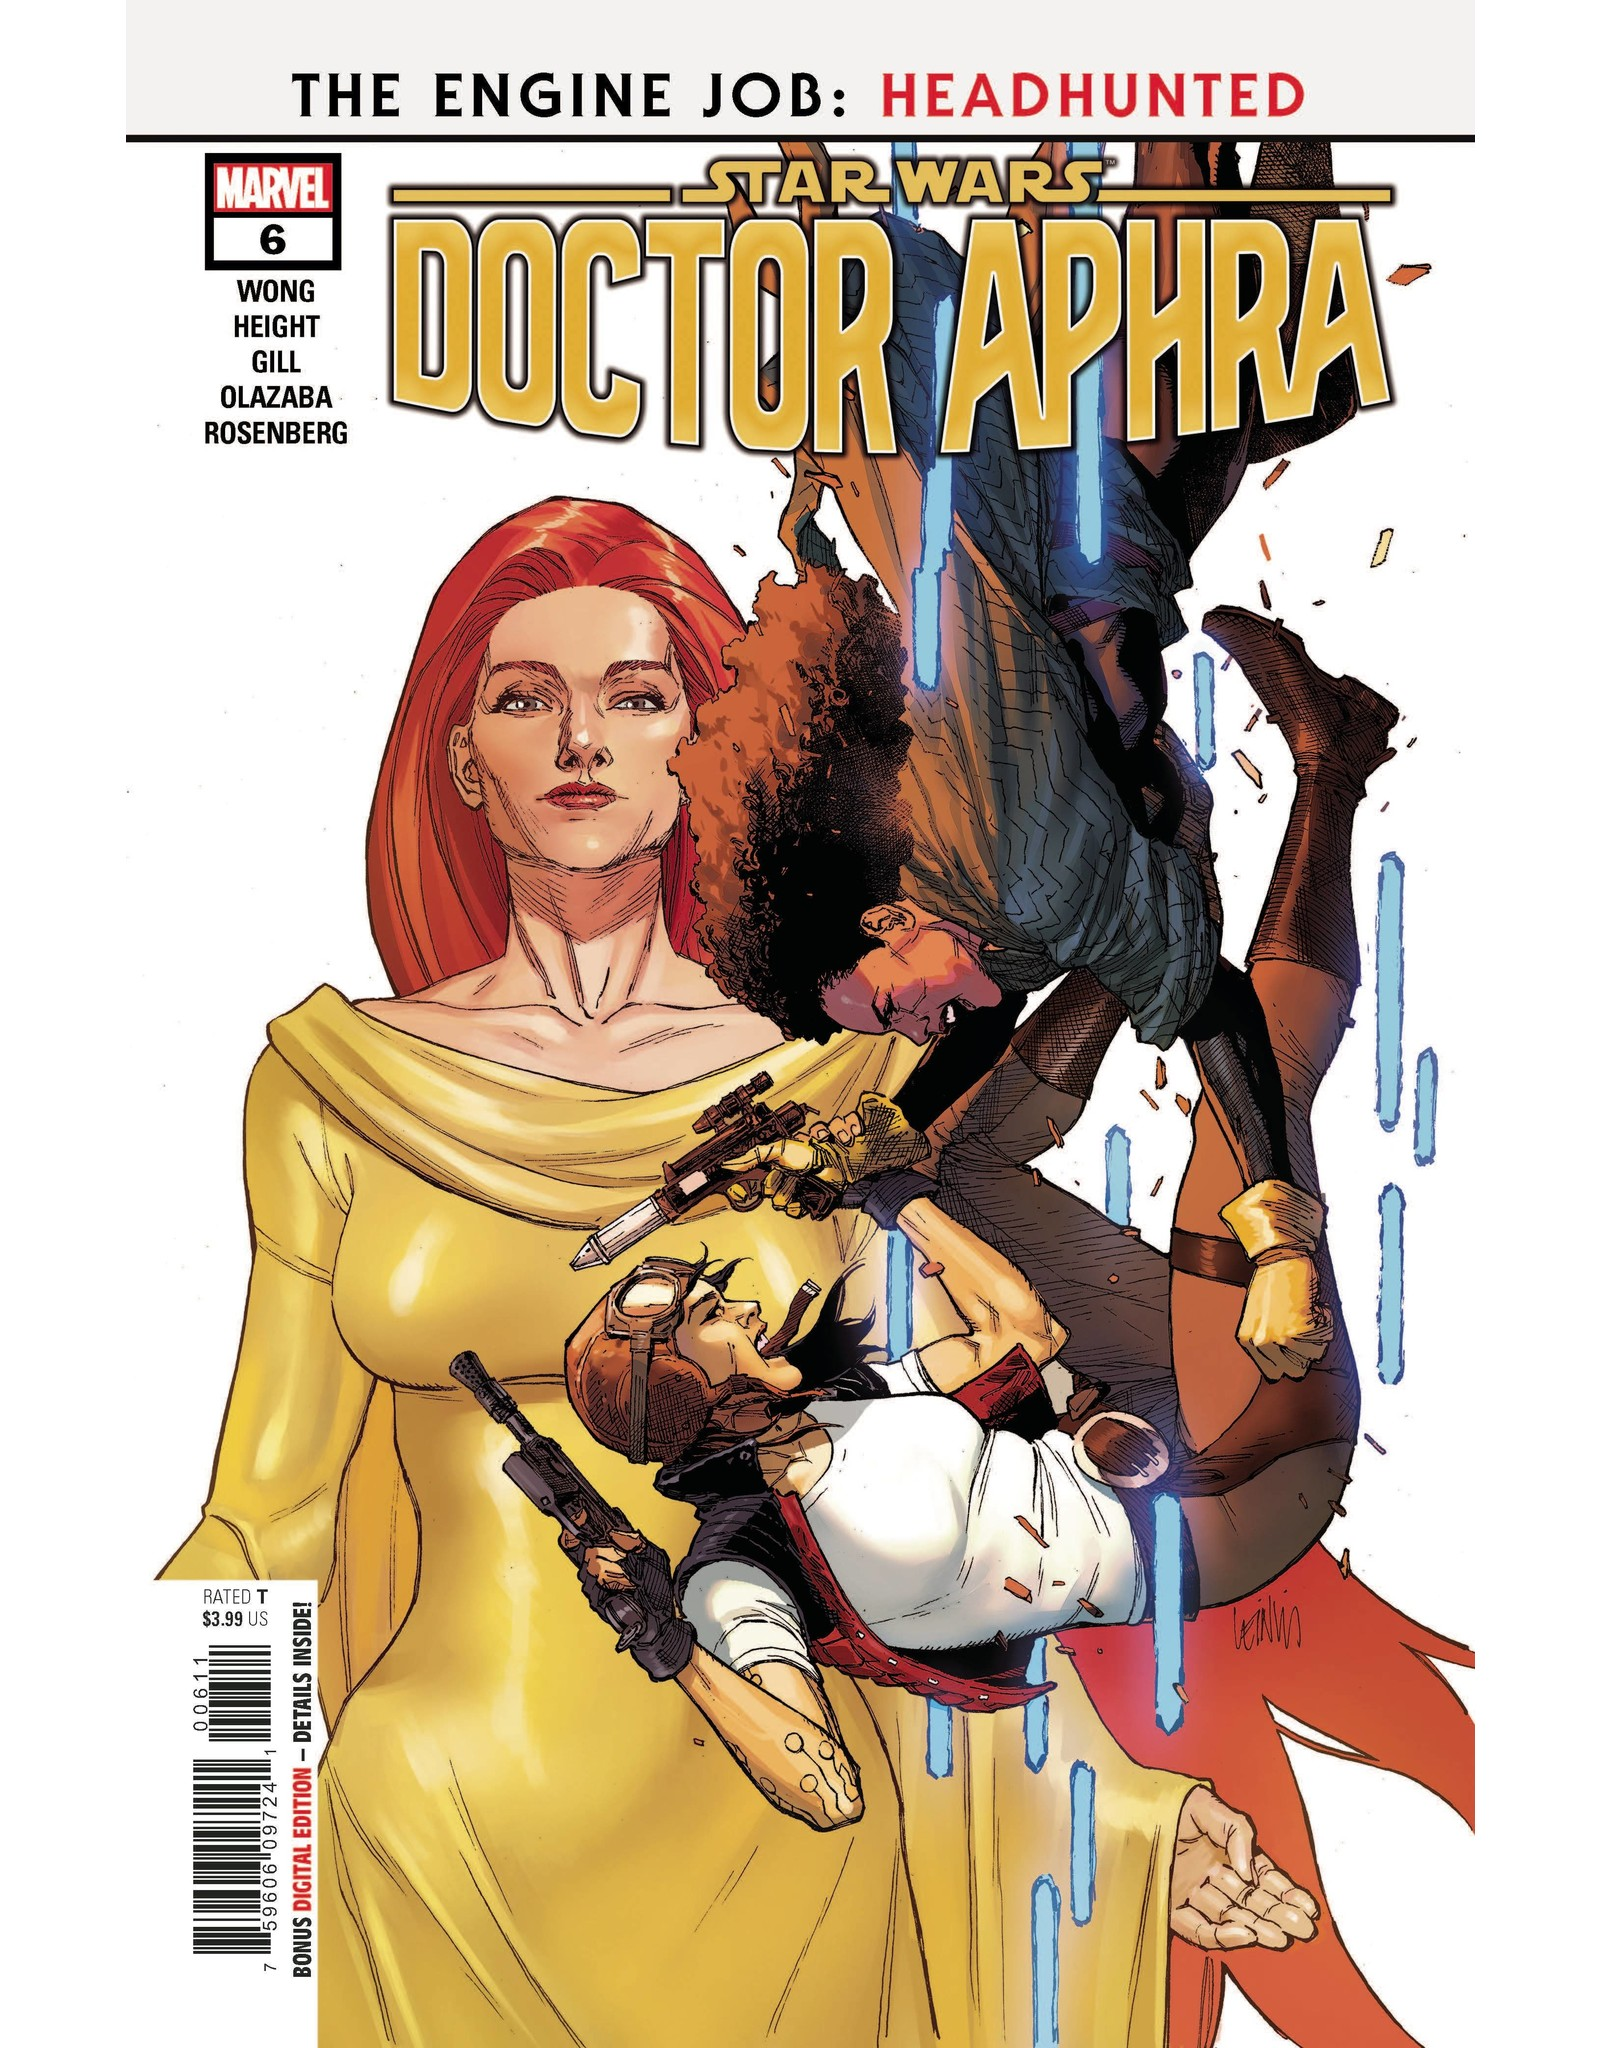 MARVEL COMICS STAR WARS DOCTOR APHRA #6